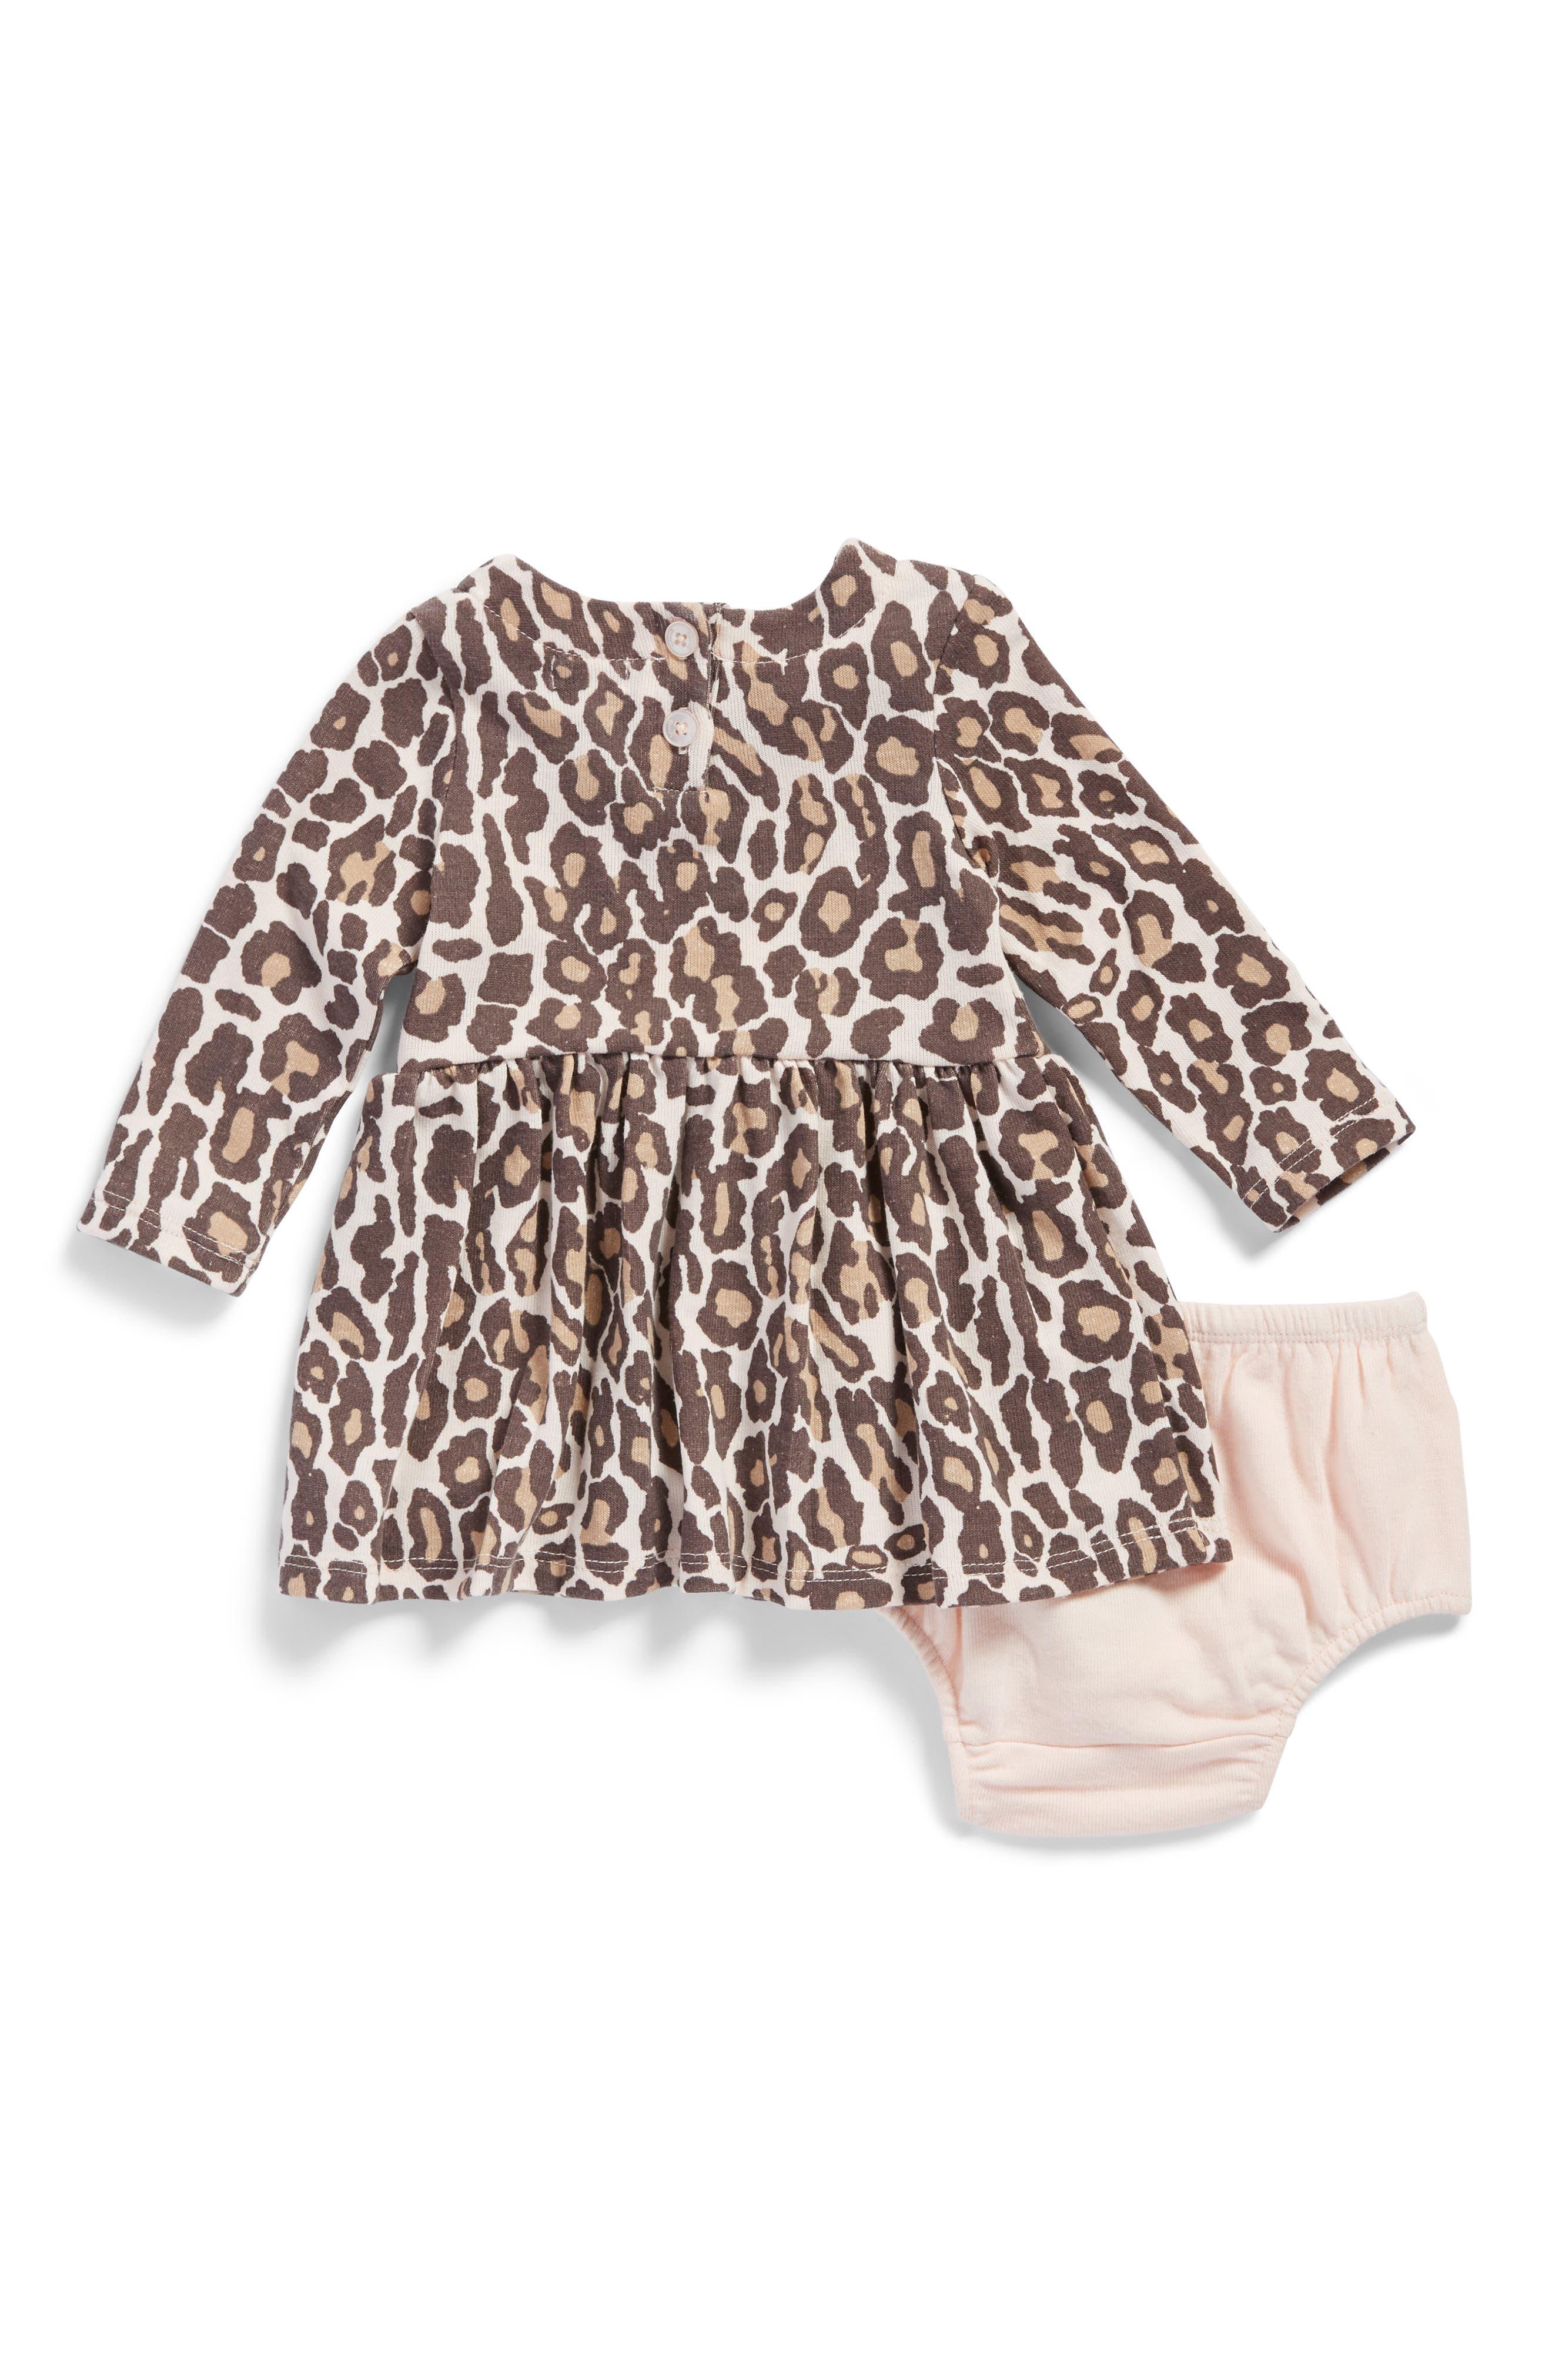 Animal Print Knit Dress,                             Alternate thumbnail 2, color,                             255